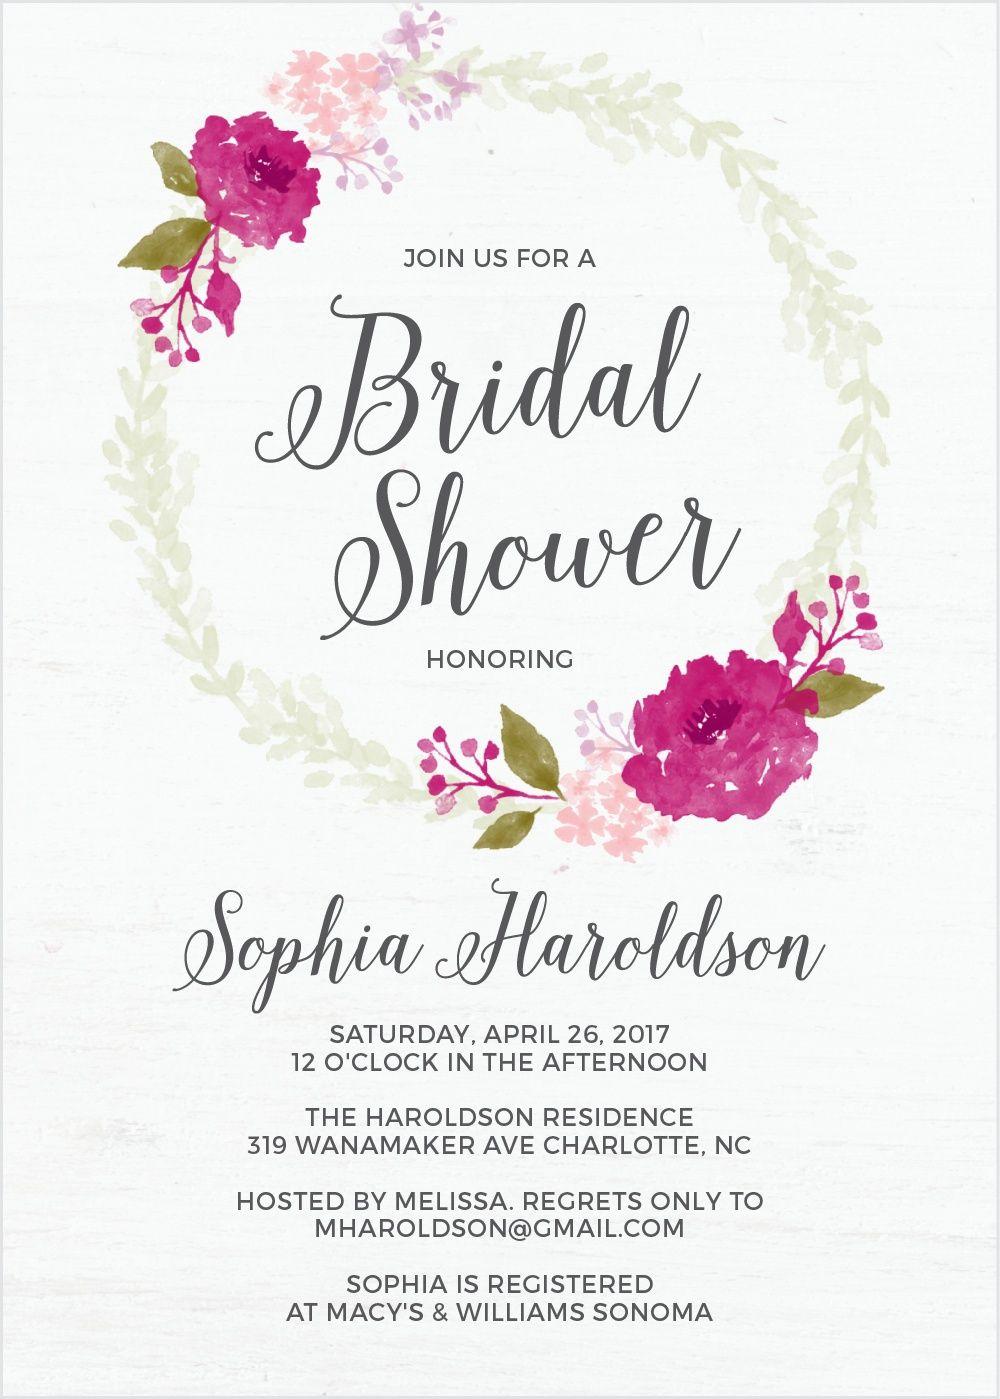 Watercolor Wreath Bridal Shower Invitations | bridal shower ideas ...